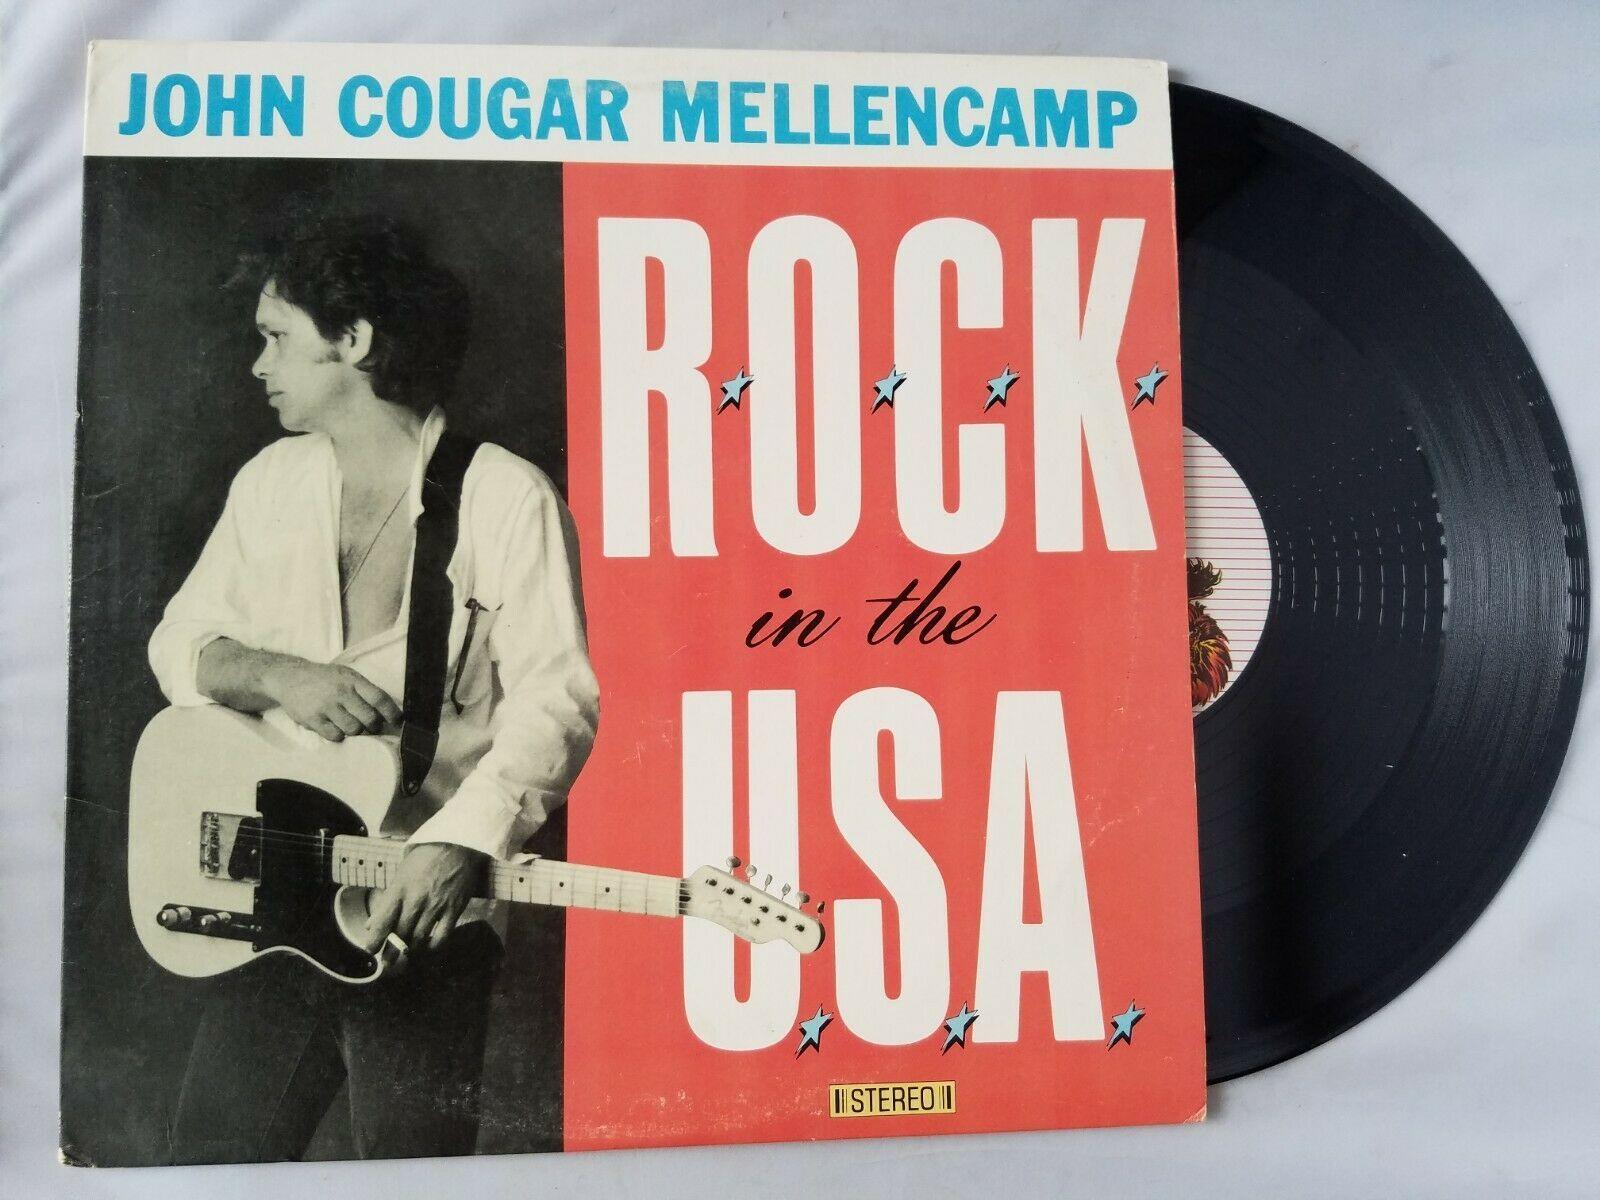 John Cougar Mellencamp Rock In The USA Vinyl Record Vintage 1986 Polygram